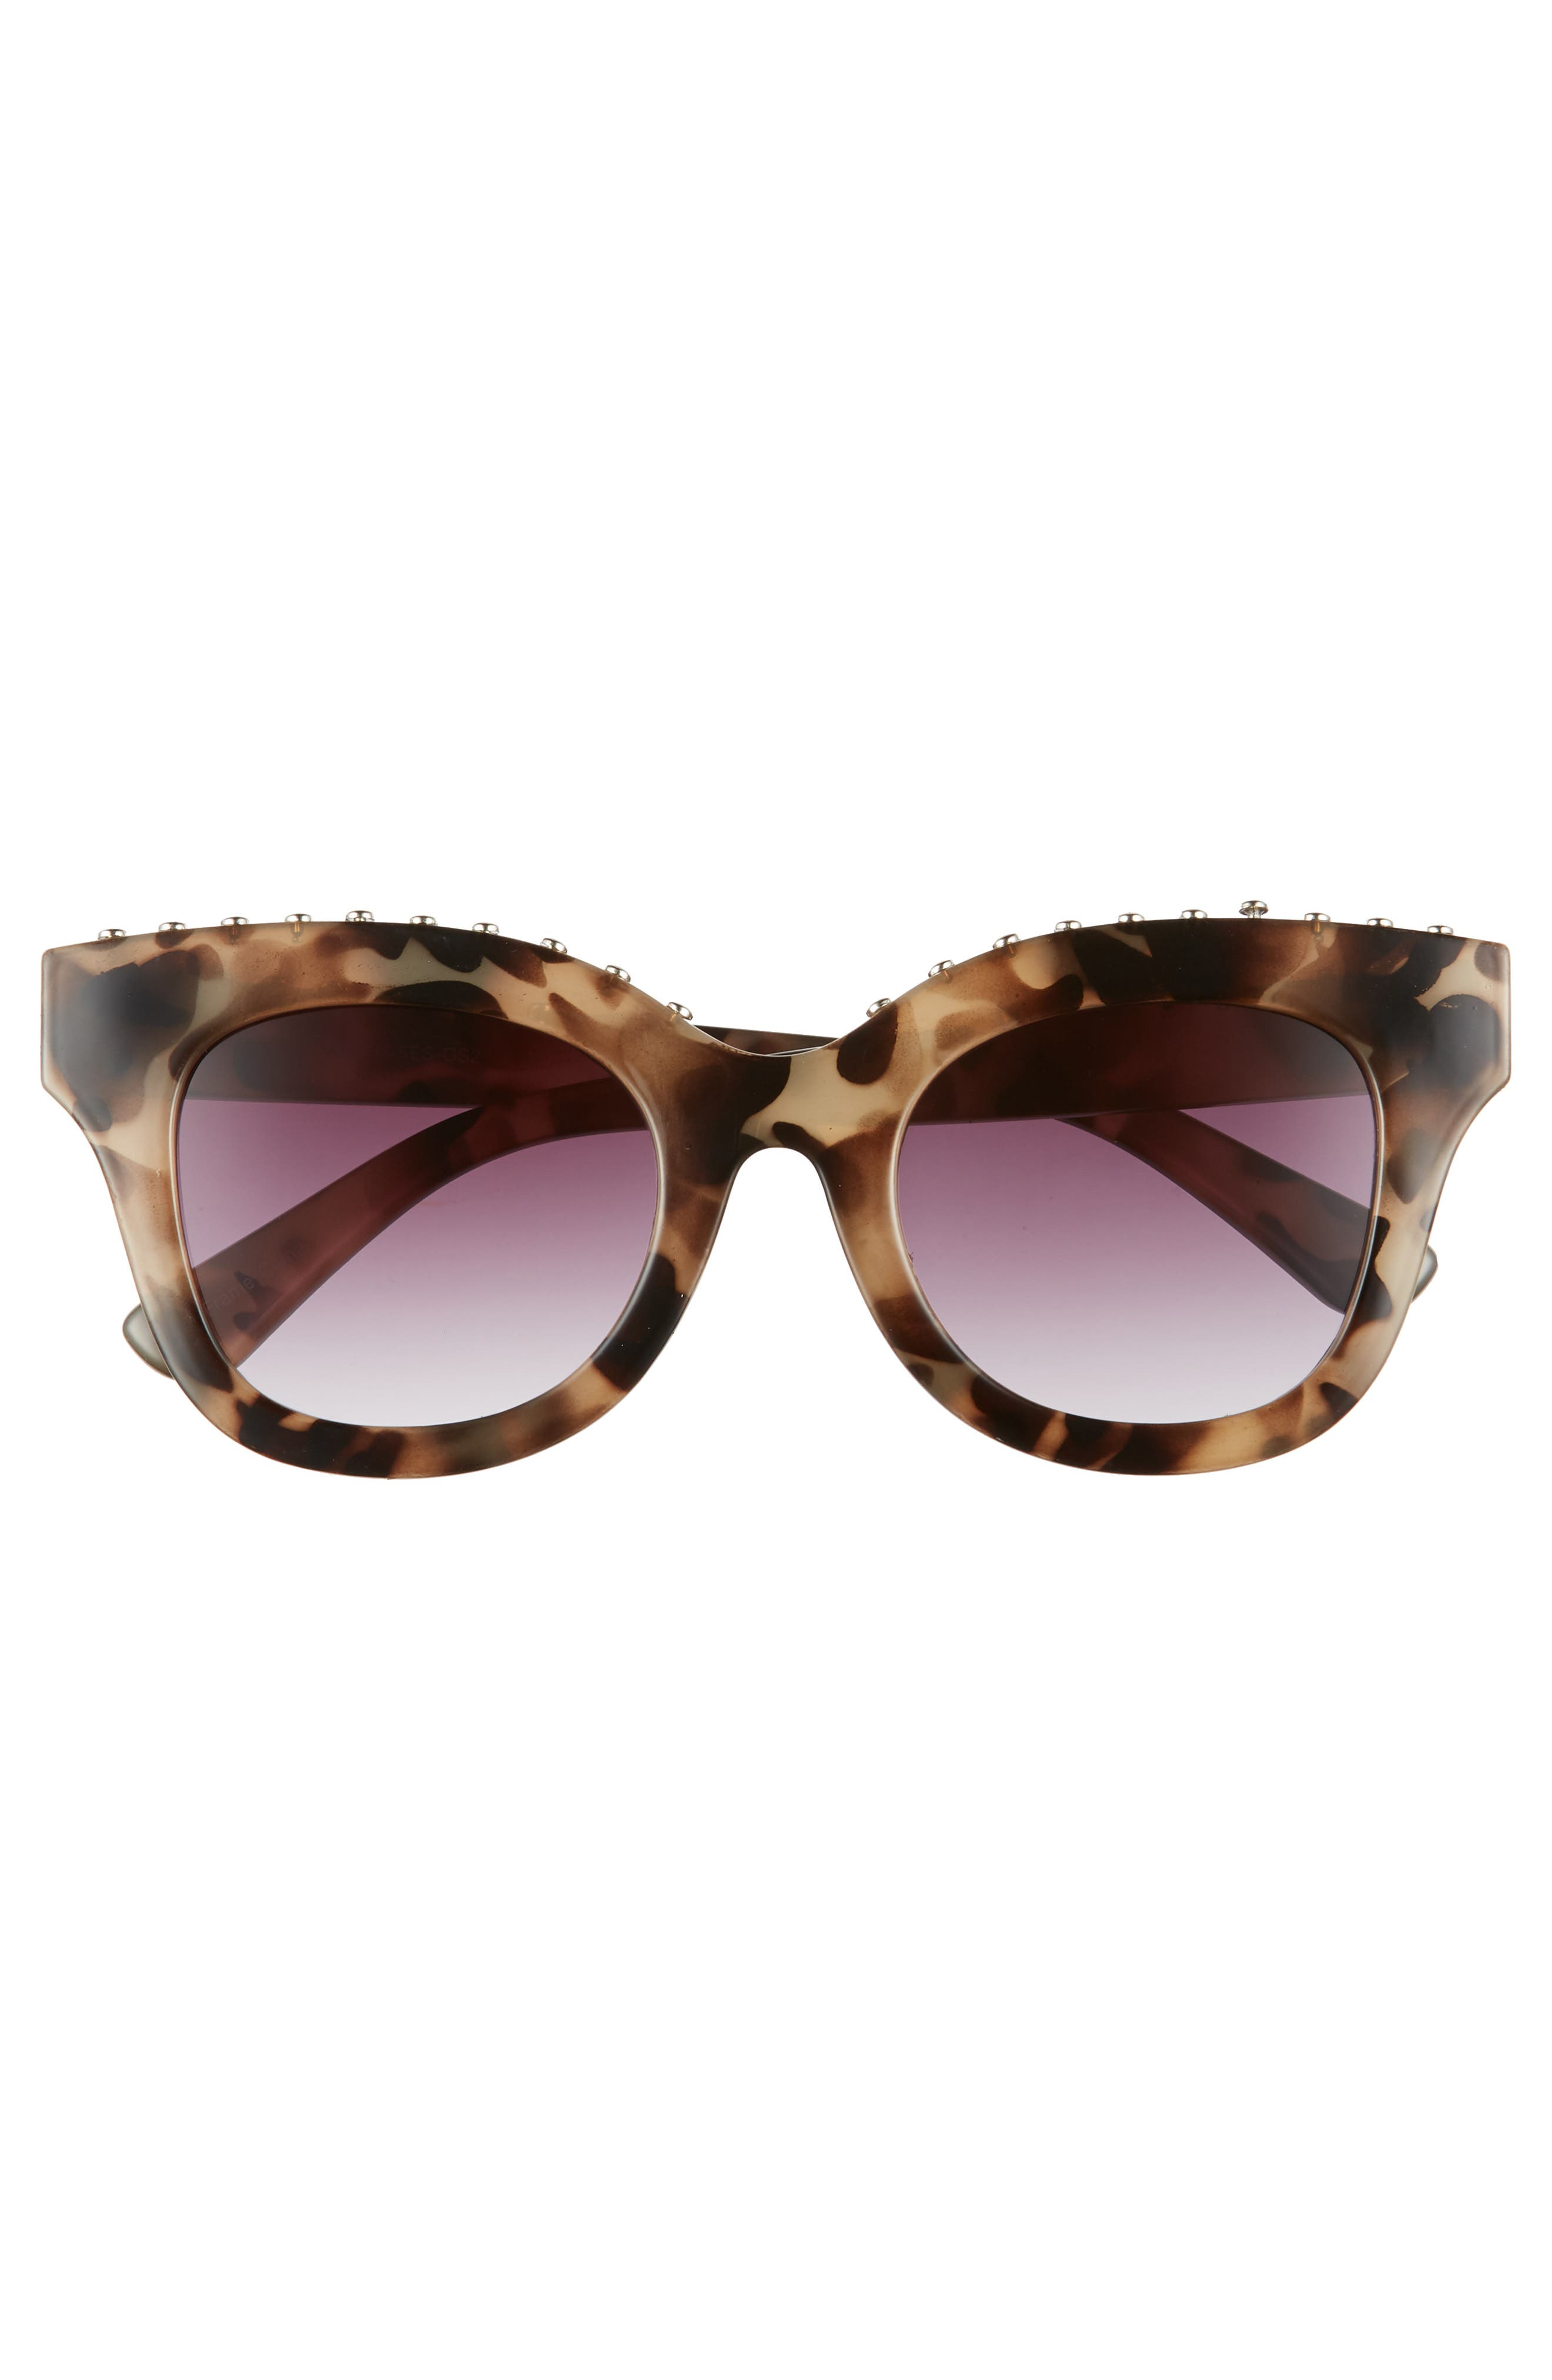 48mm Studded Sunglasses,                             Alternate thumbnail 3, color,                             Tort/ Silver